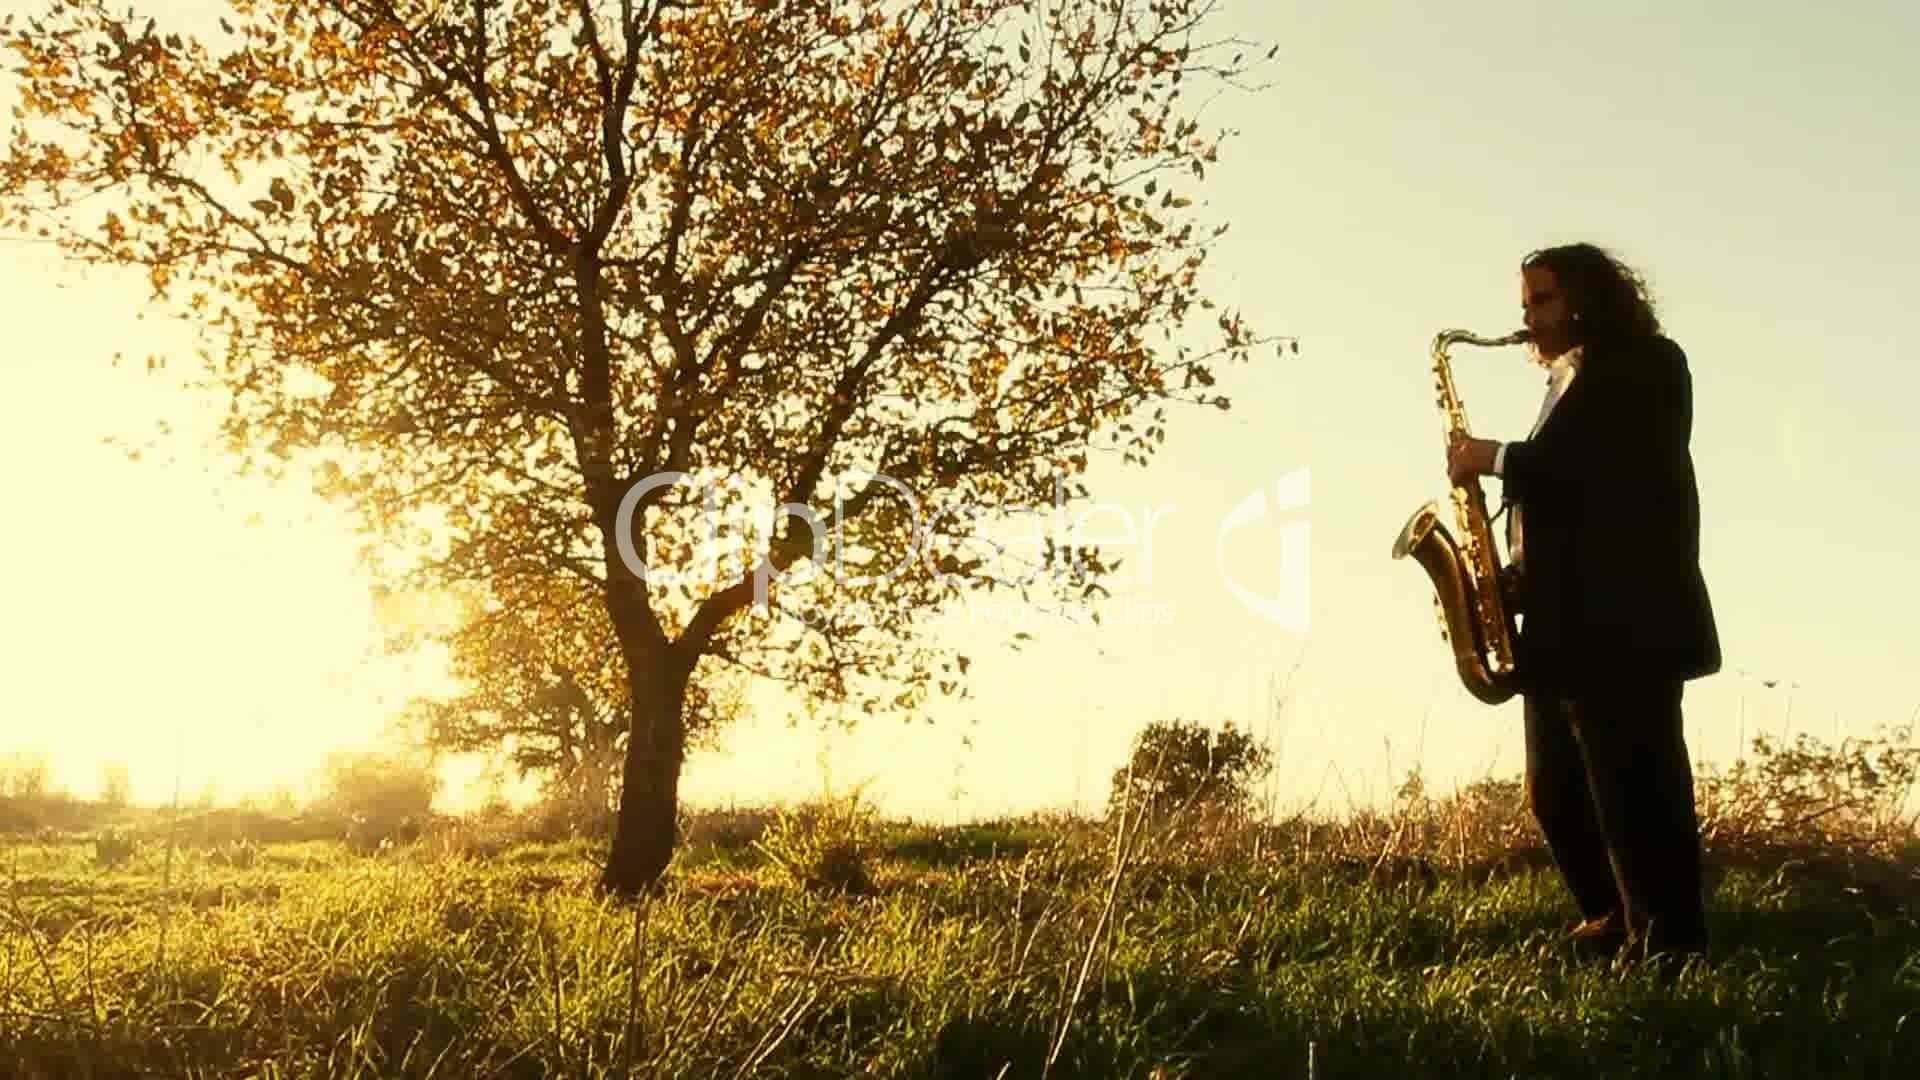 Jazz Saxophone Wallpaper Desktop Background #4qz4nu px 120.95 KB  Music Baritone. Iphone.